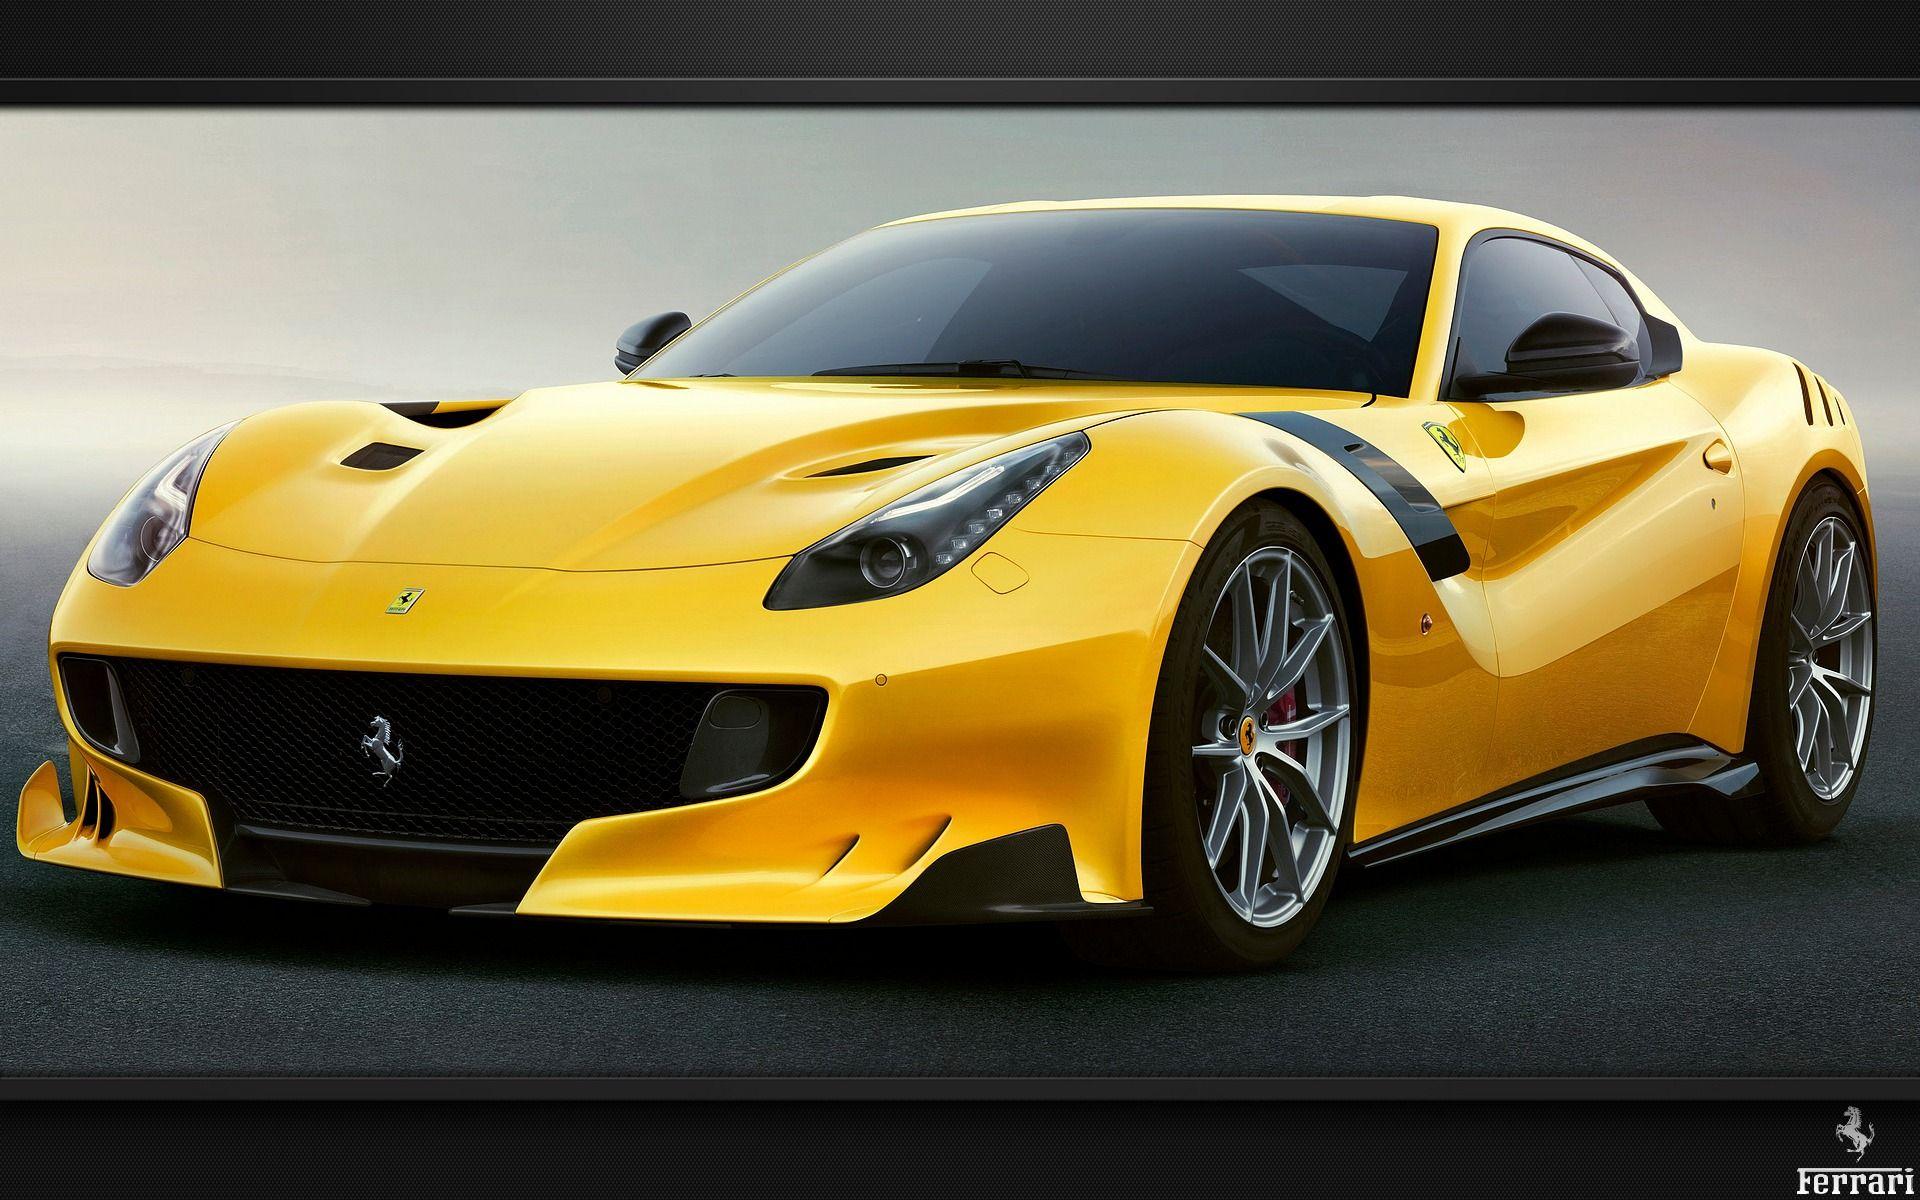 Exceptionnel voiture de sport Ferrari jaune F12-tdf | no1 | Pinterest | Ecran  OH67